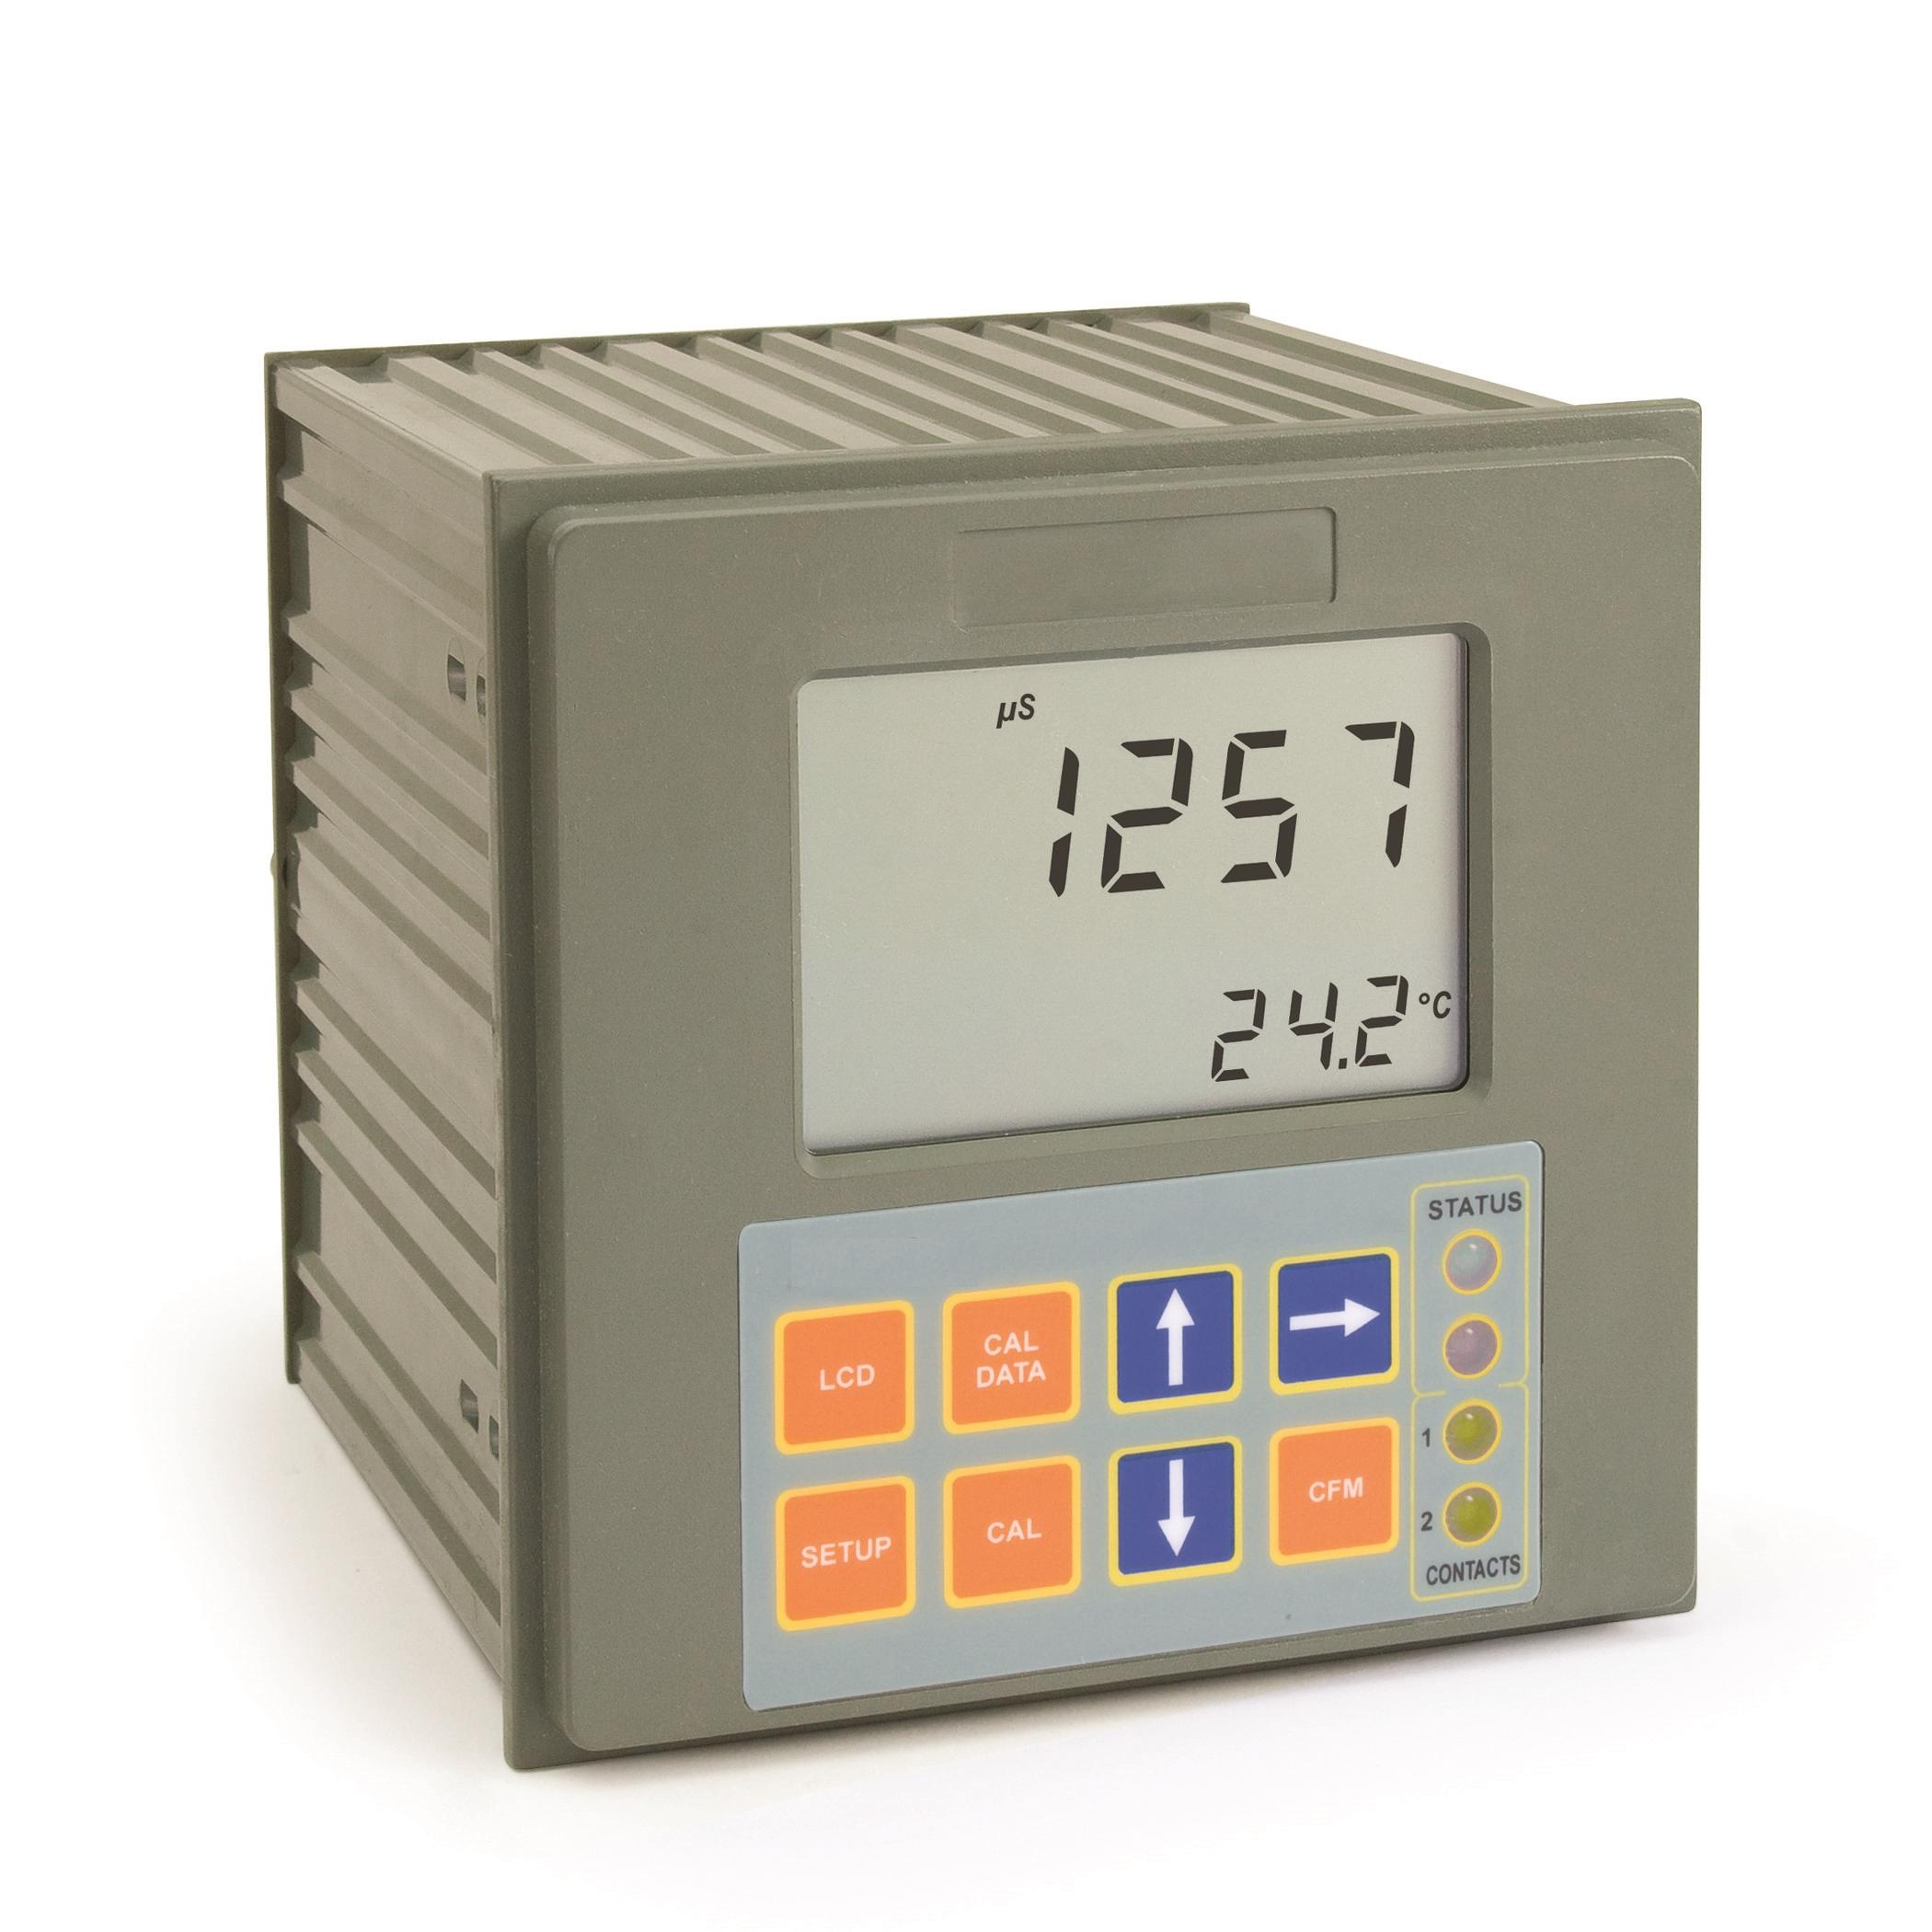 Panel-mounted Conductivity Controller - HI700 Series